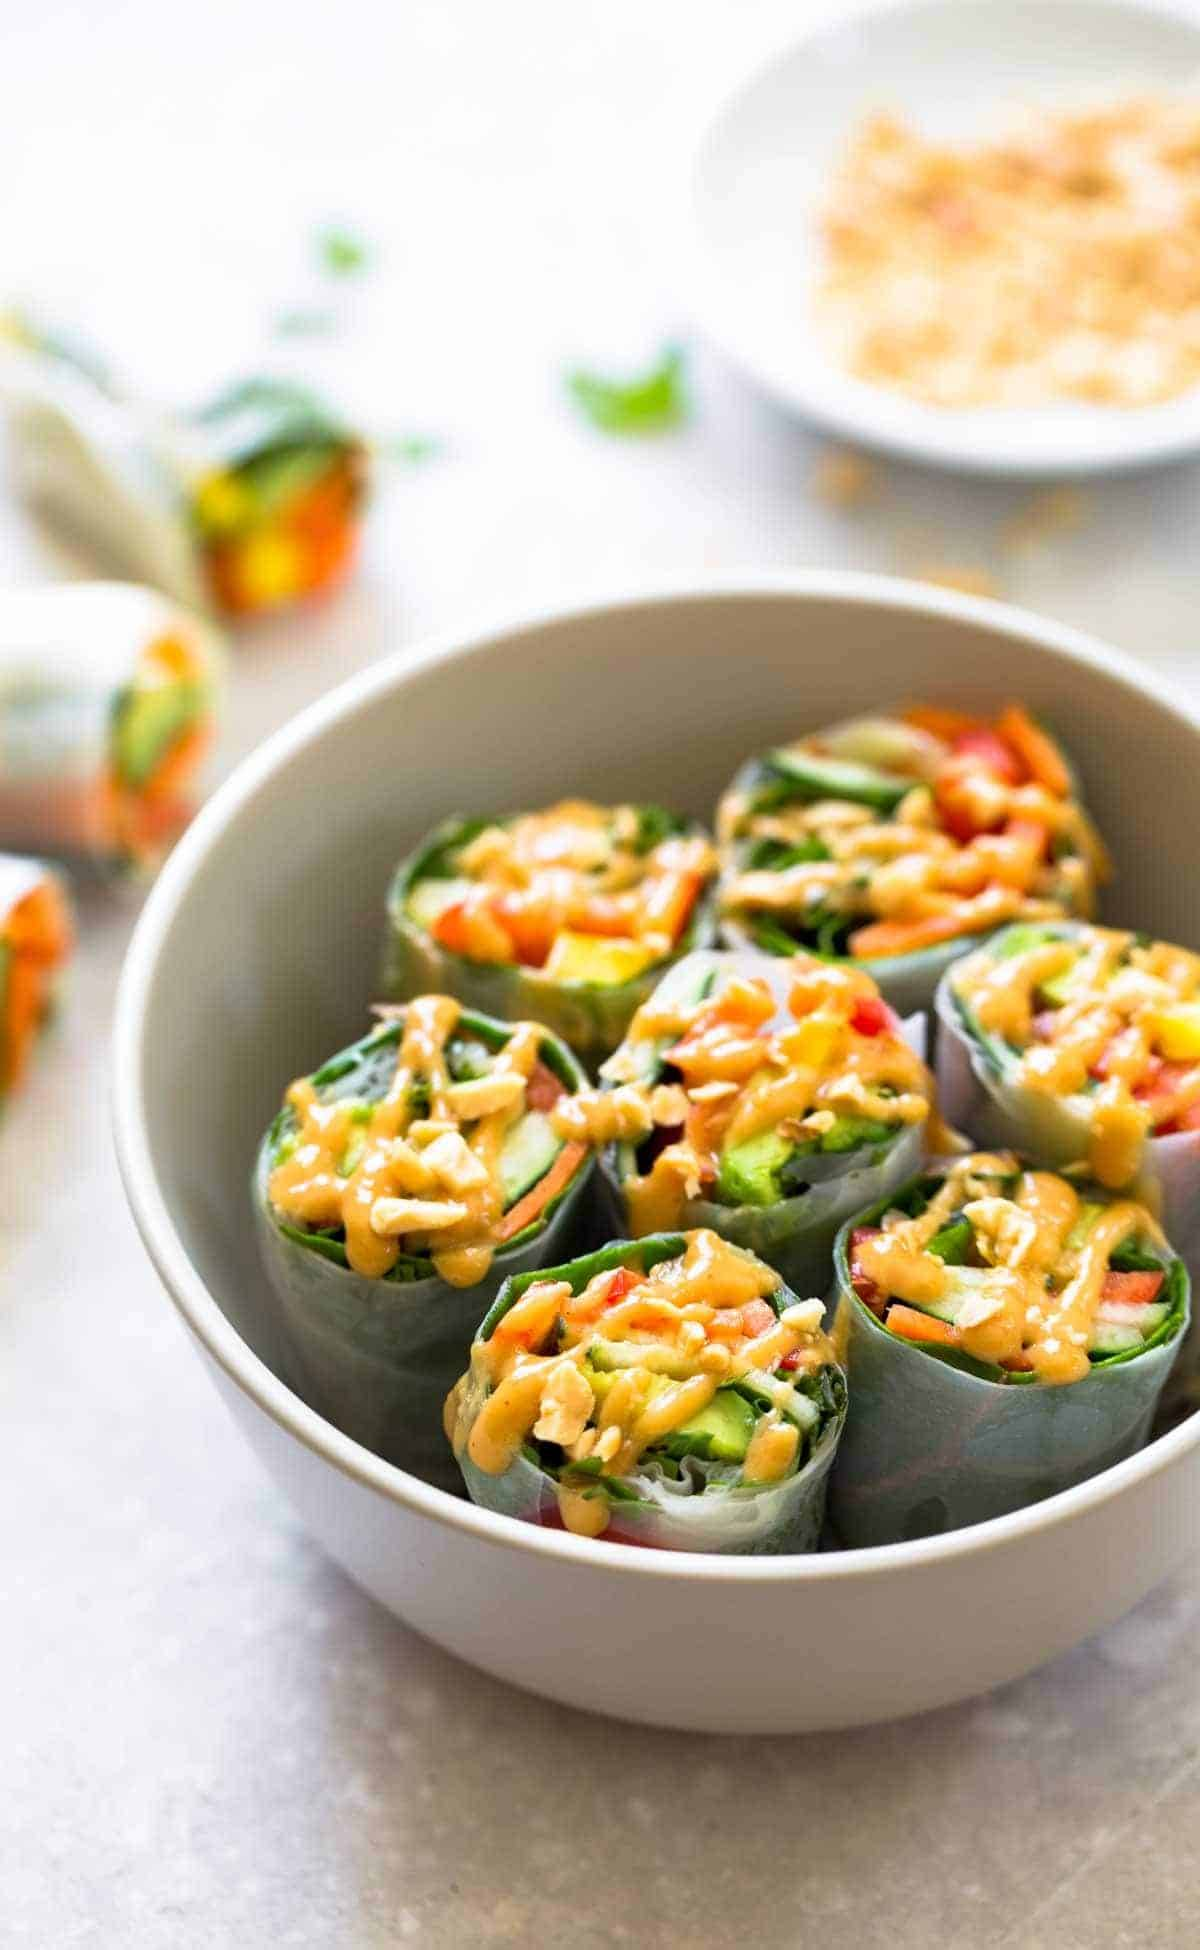 Thai summer rolls with peanut sauce recipe pinch of yum thai summer rolls with peanut sauce in a bowl forumfinder Images